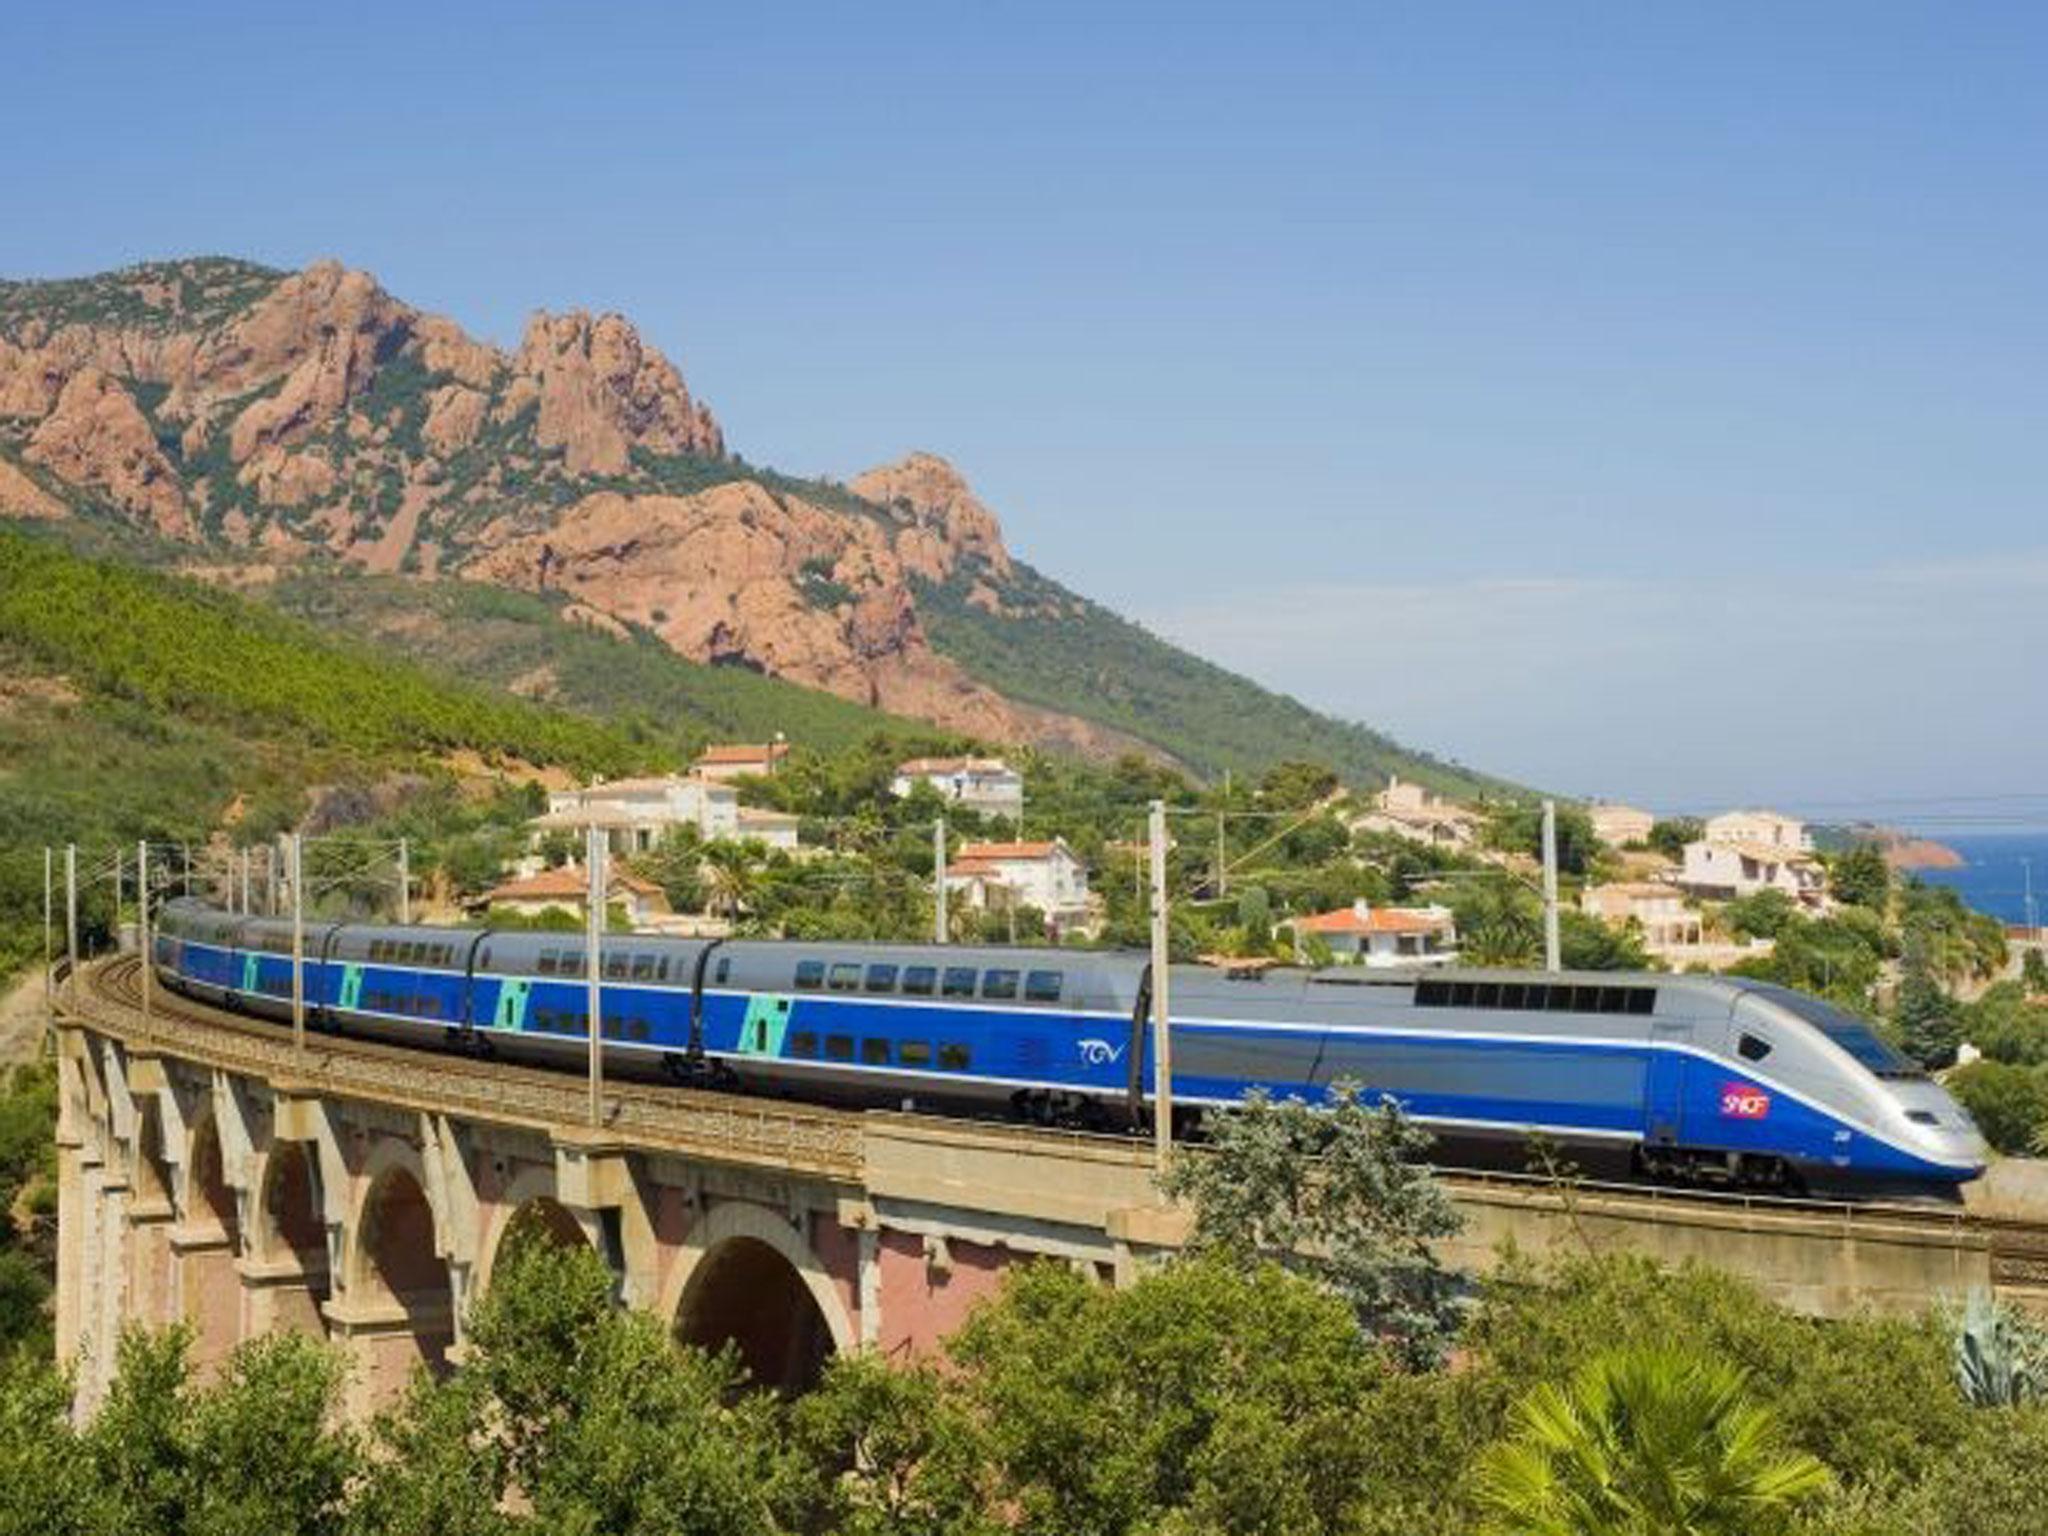 New High Speed Rail Link From Paris Breakfast In London